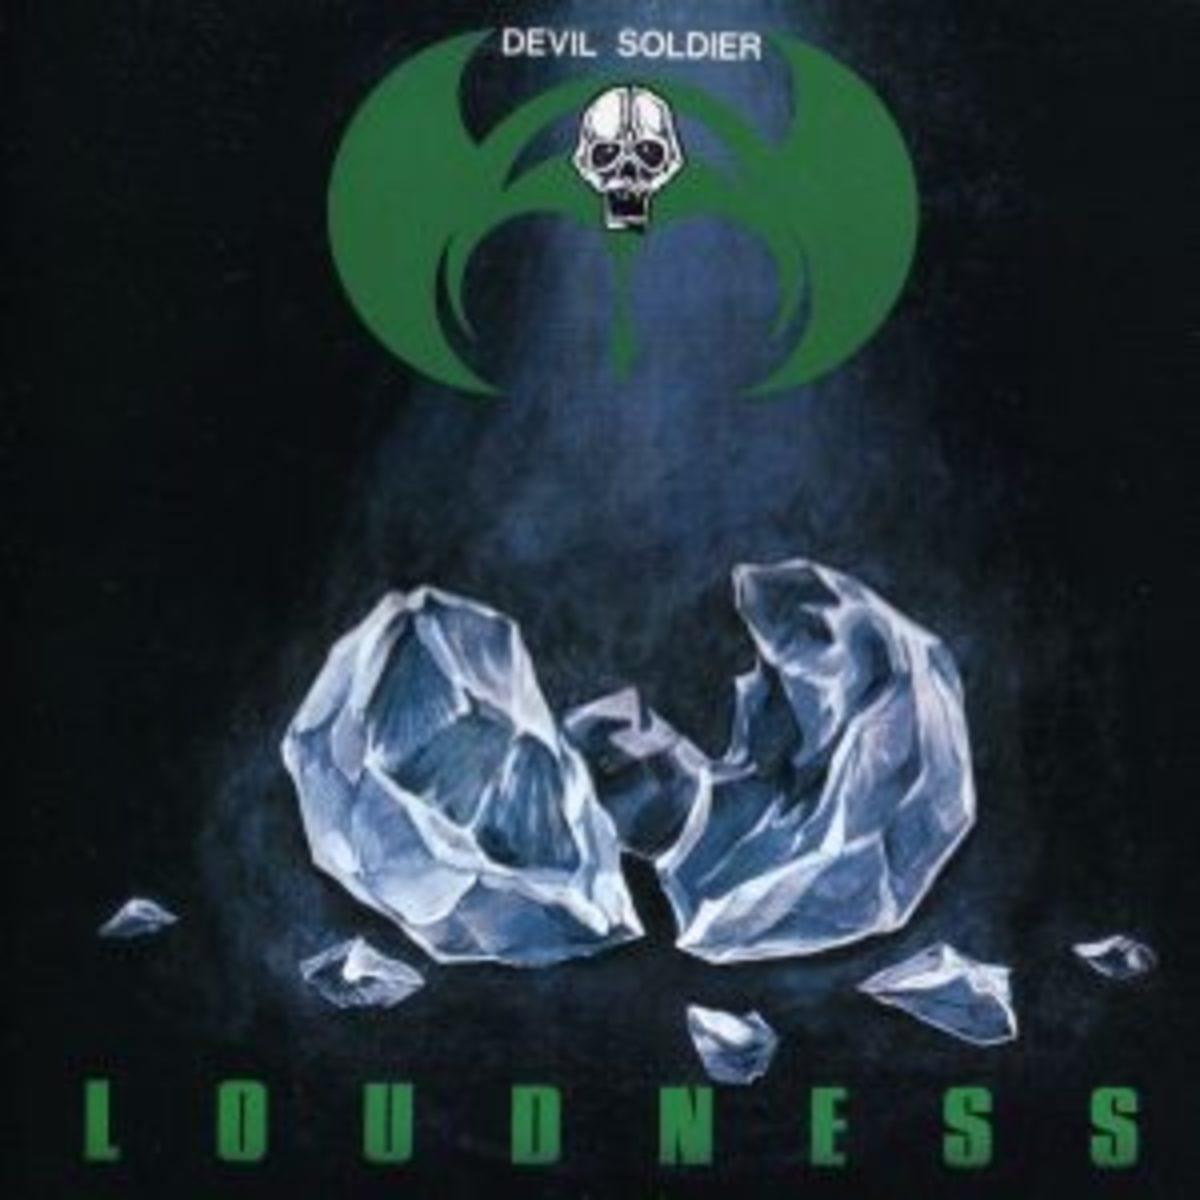 loudness-devilsoldier